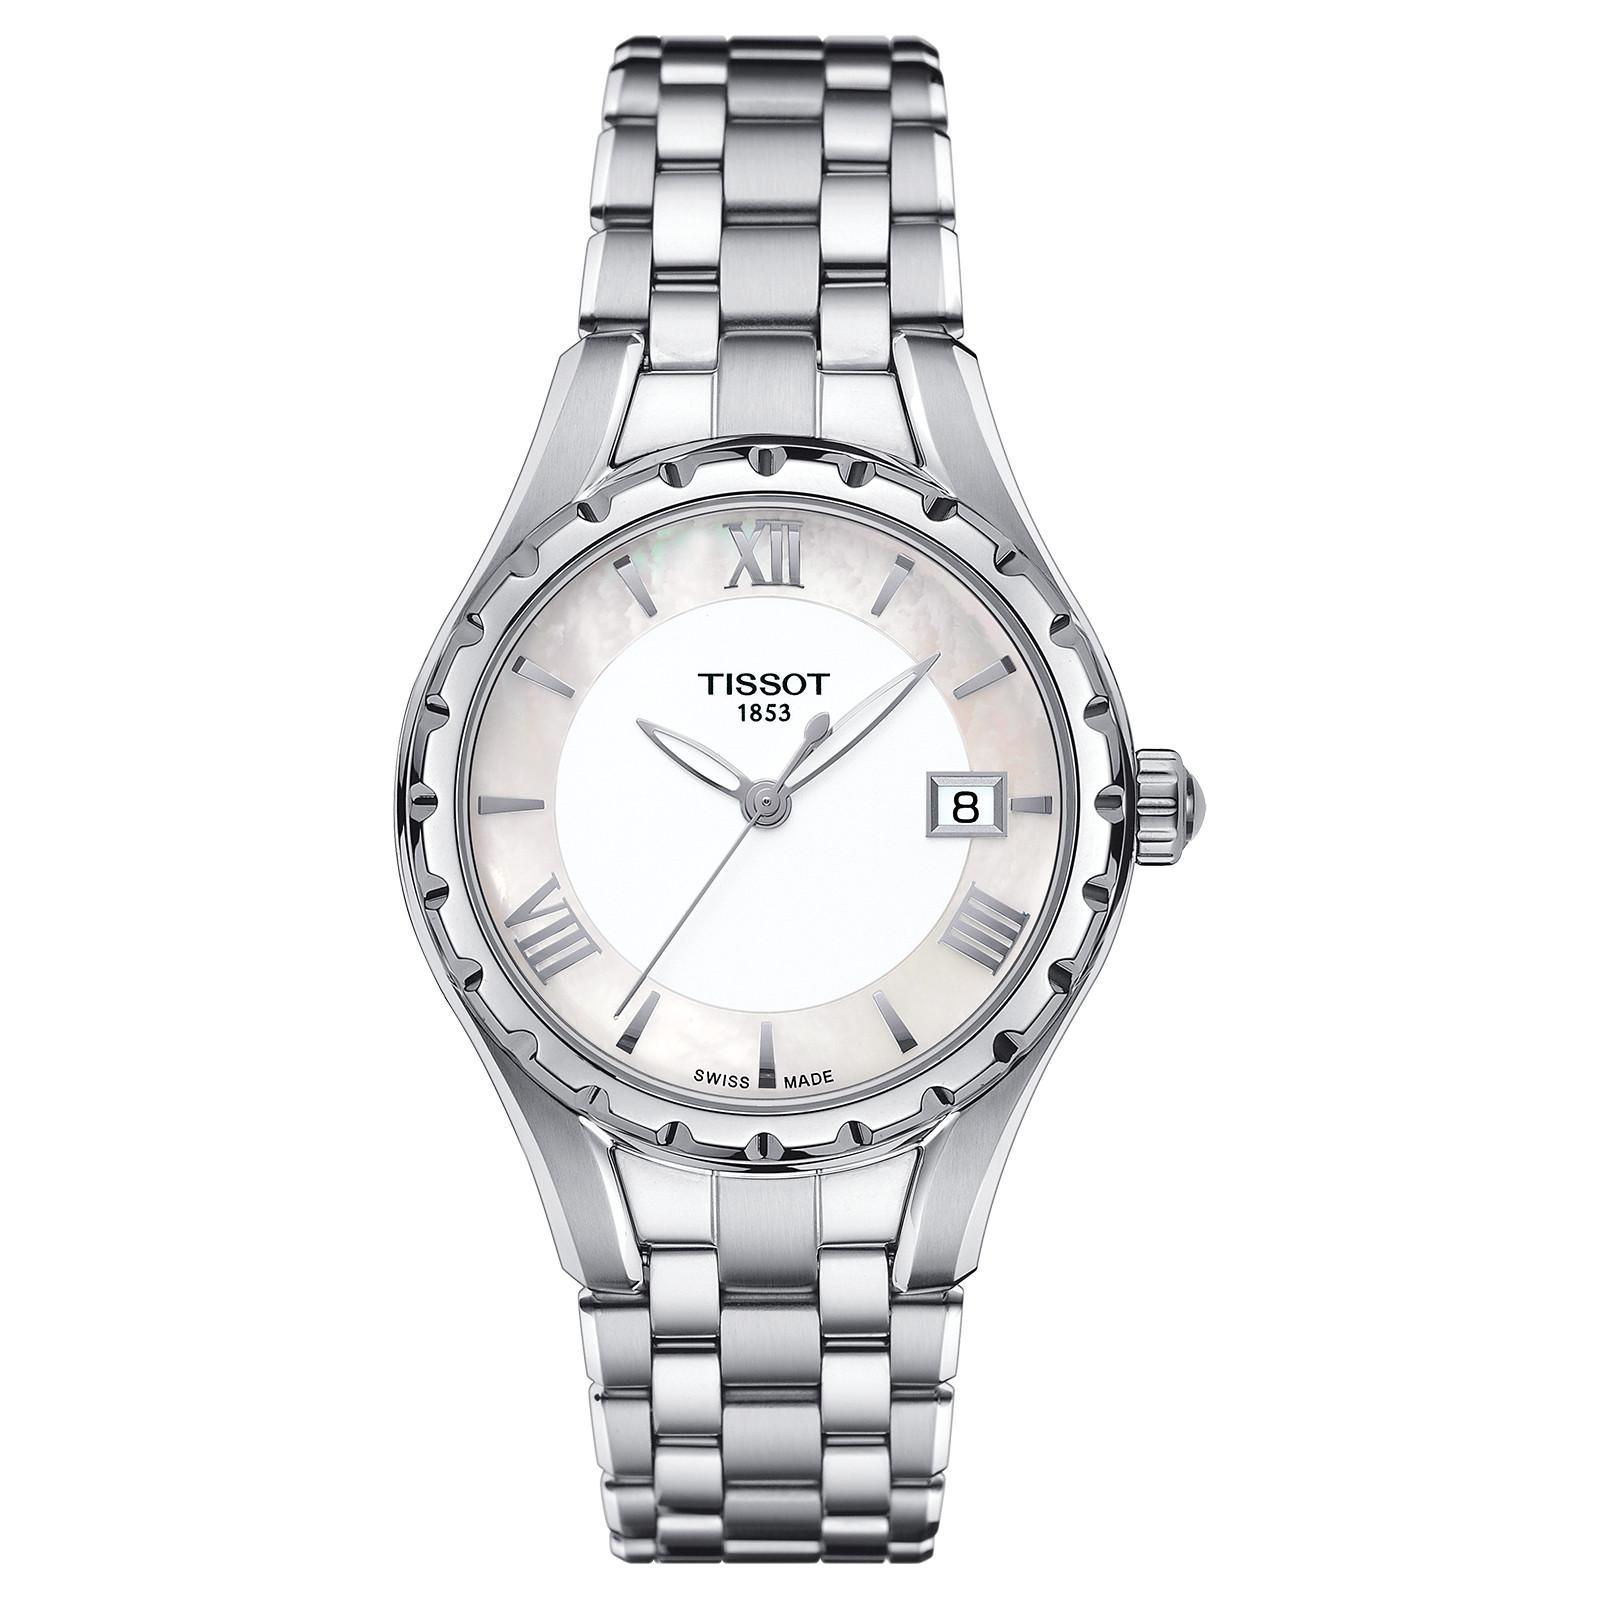 New Tissot Lady Quartz Watch